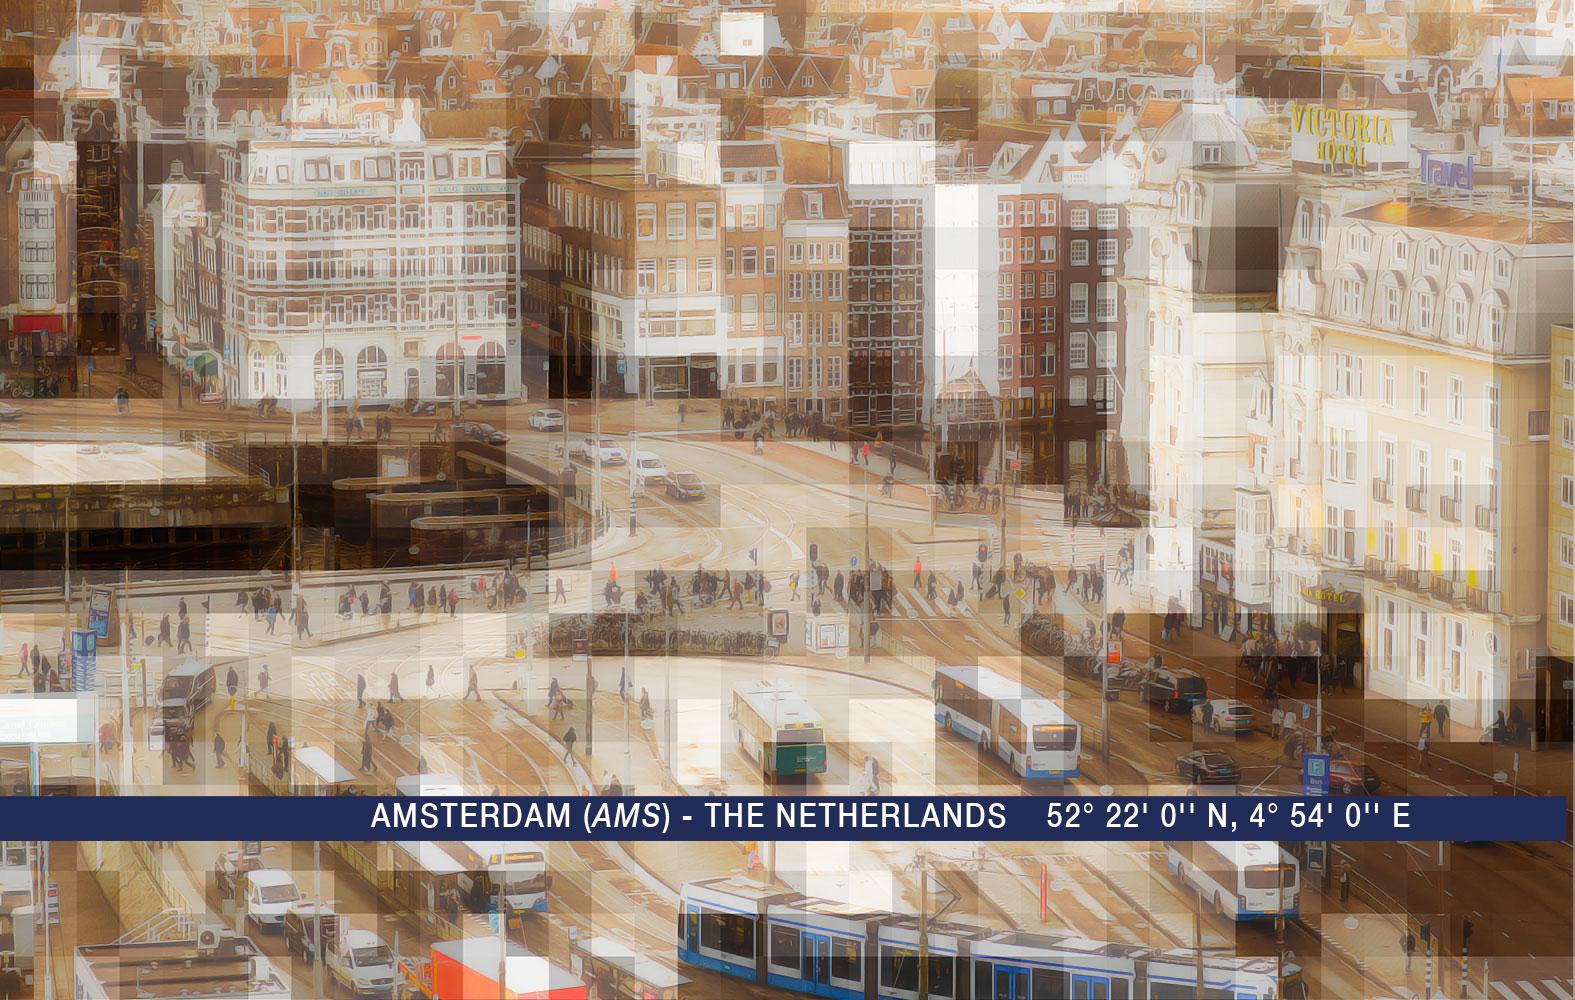 StudioErnst-HMShost-cityscapes-amsterdam